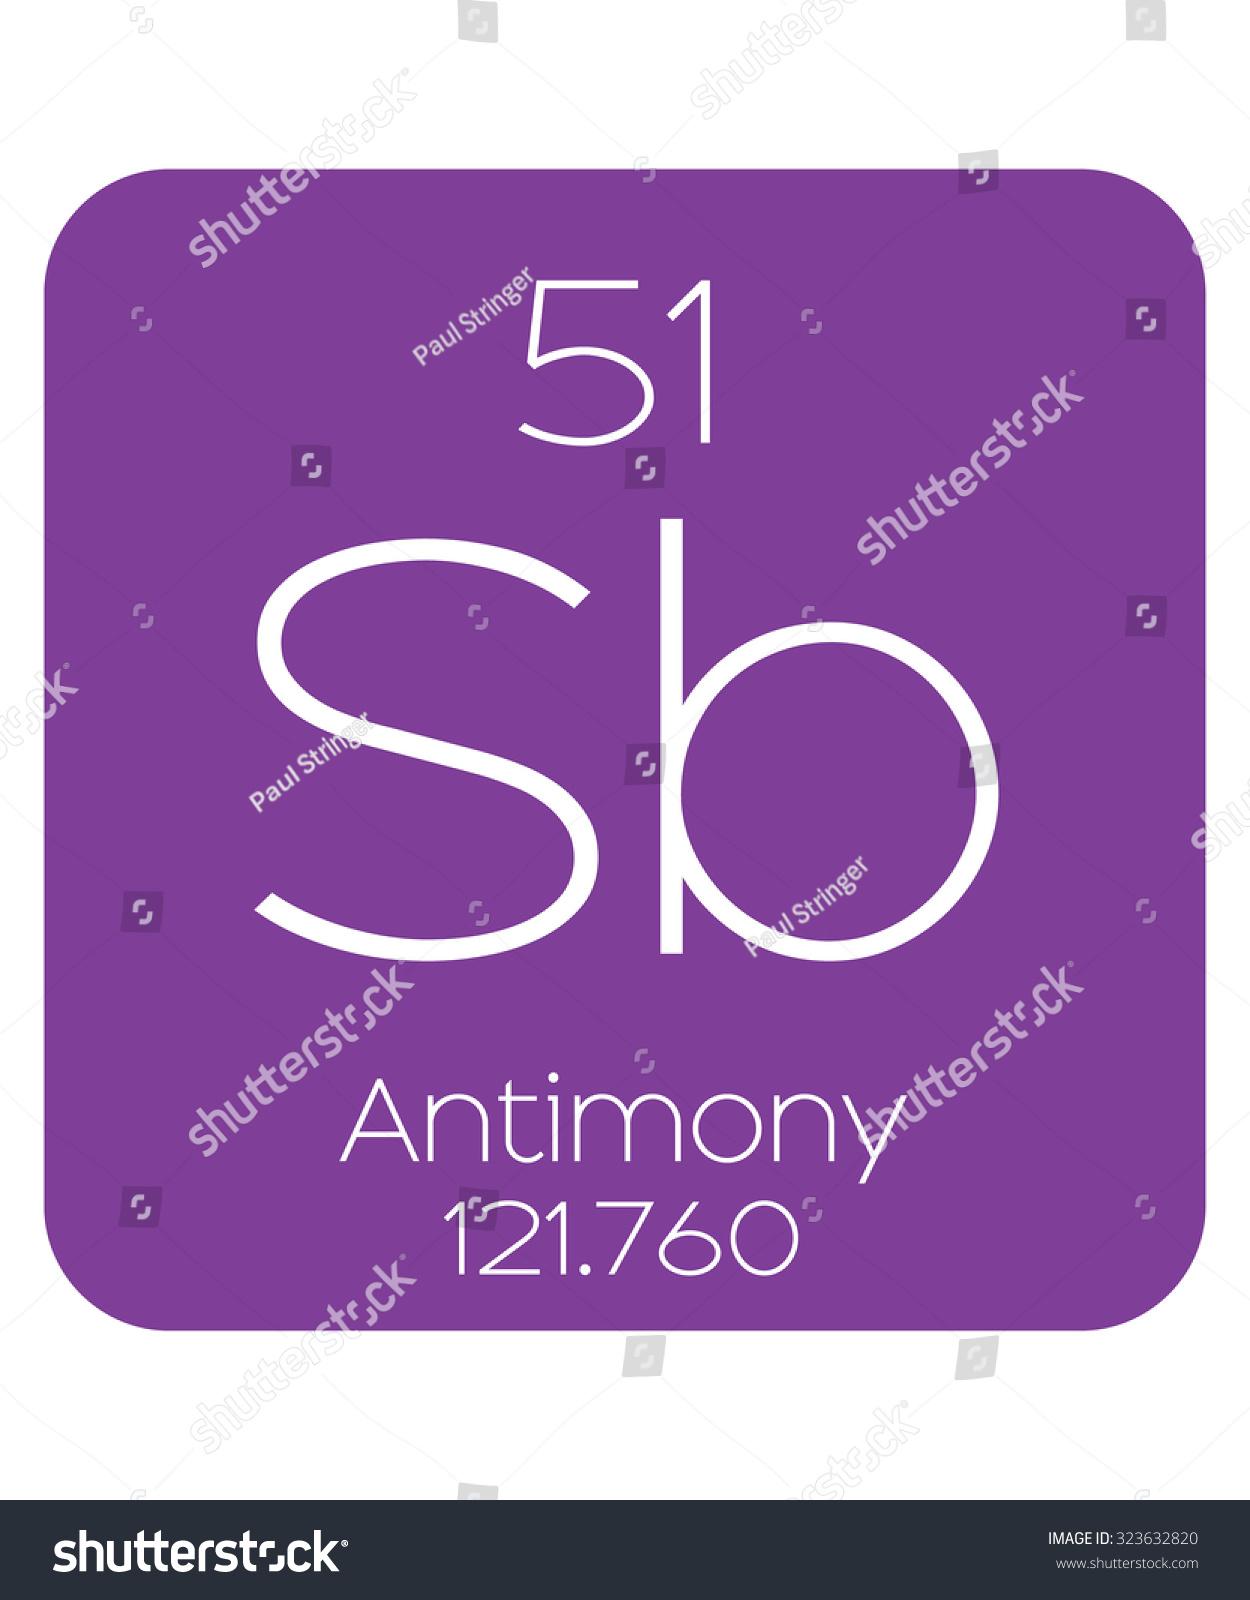 Periodic table elements antimony stock vector 323632820 shutterstock the periodic table of the elements antimony gamestrikefo Choice Image